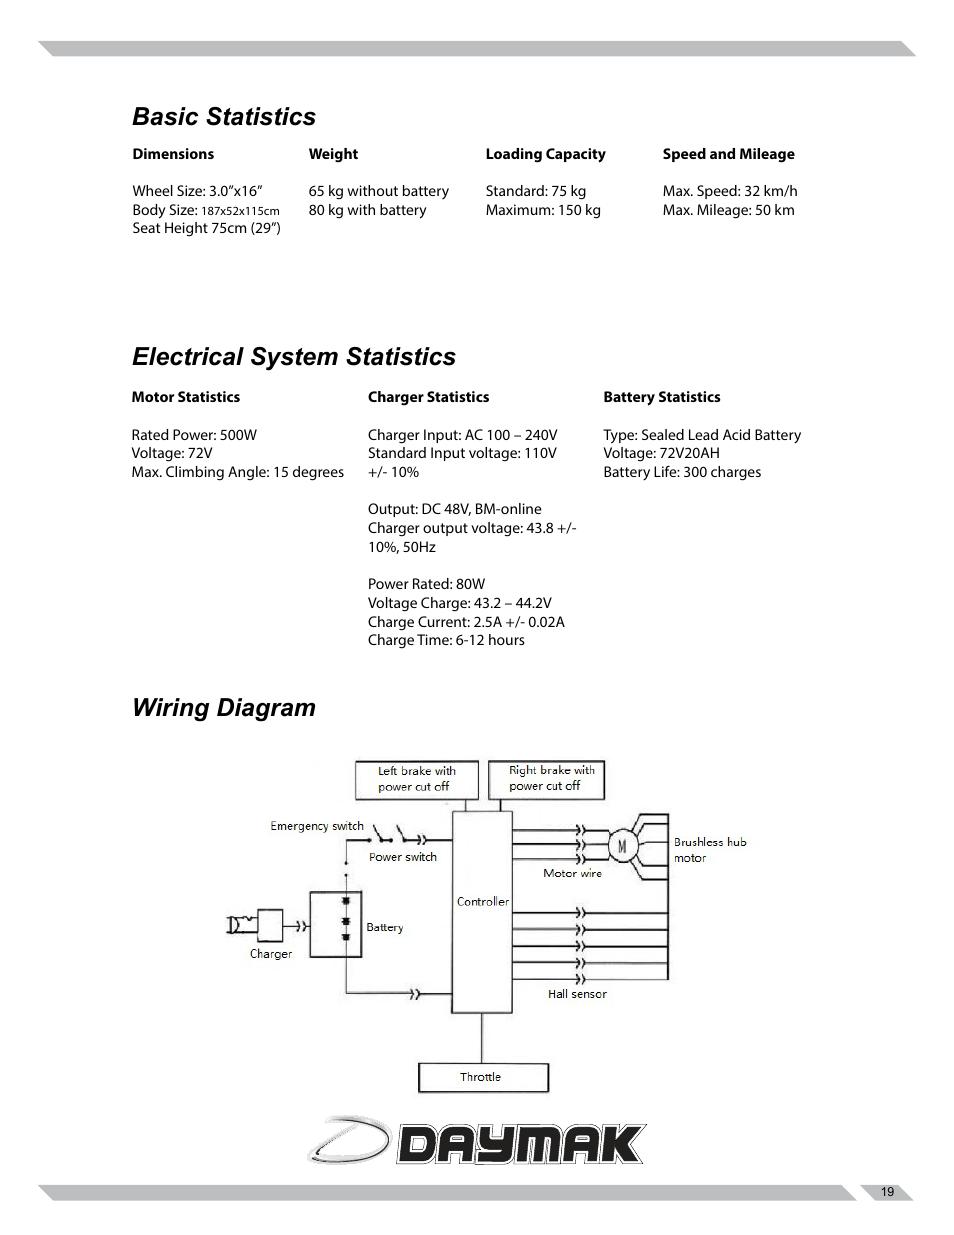 72v Wiring Diagram Schematics Diagrams E Bike Daymak Austin User Manual Page 19 27 Rh Manualsdir Com Cushman Hauler Pro